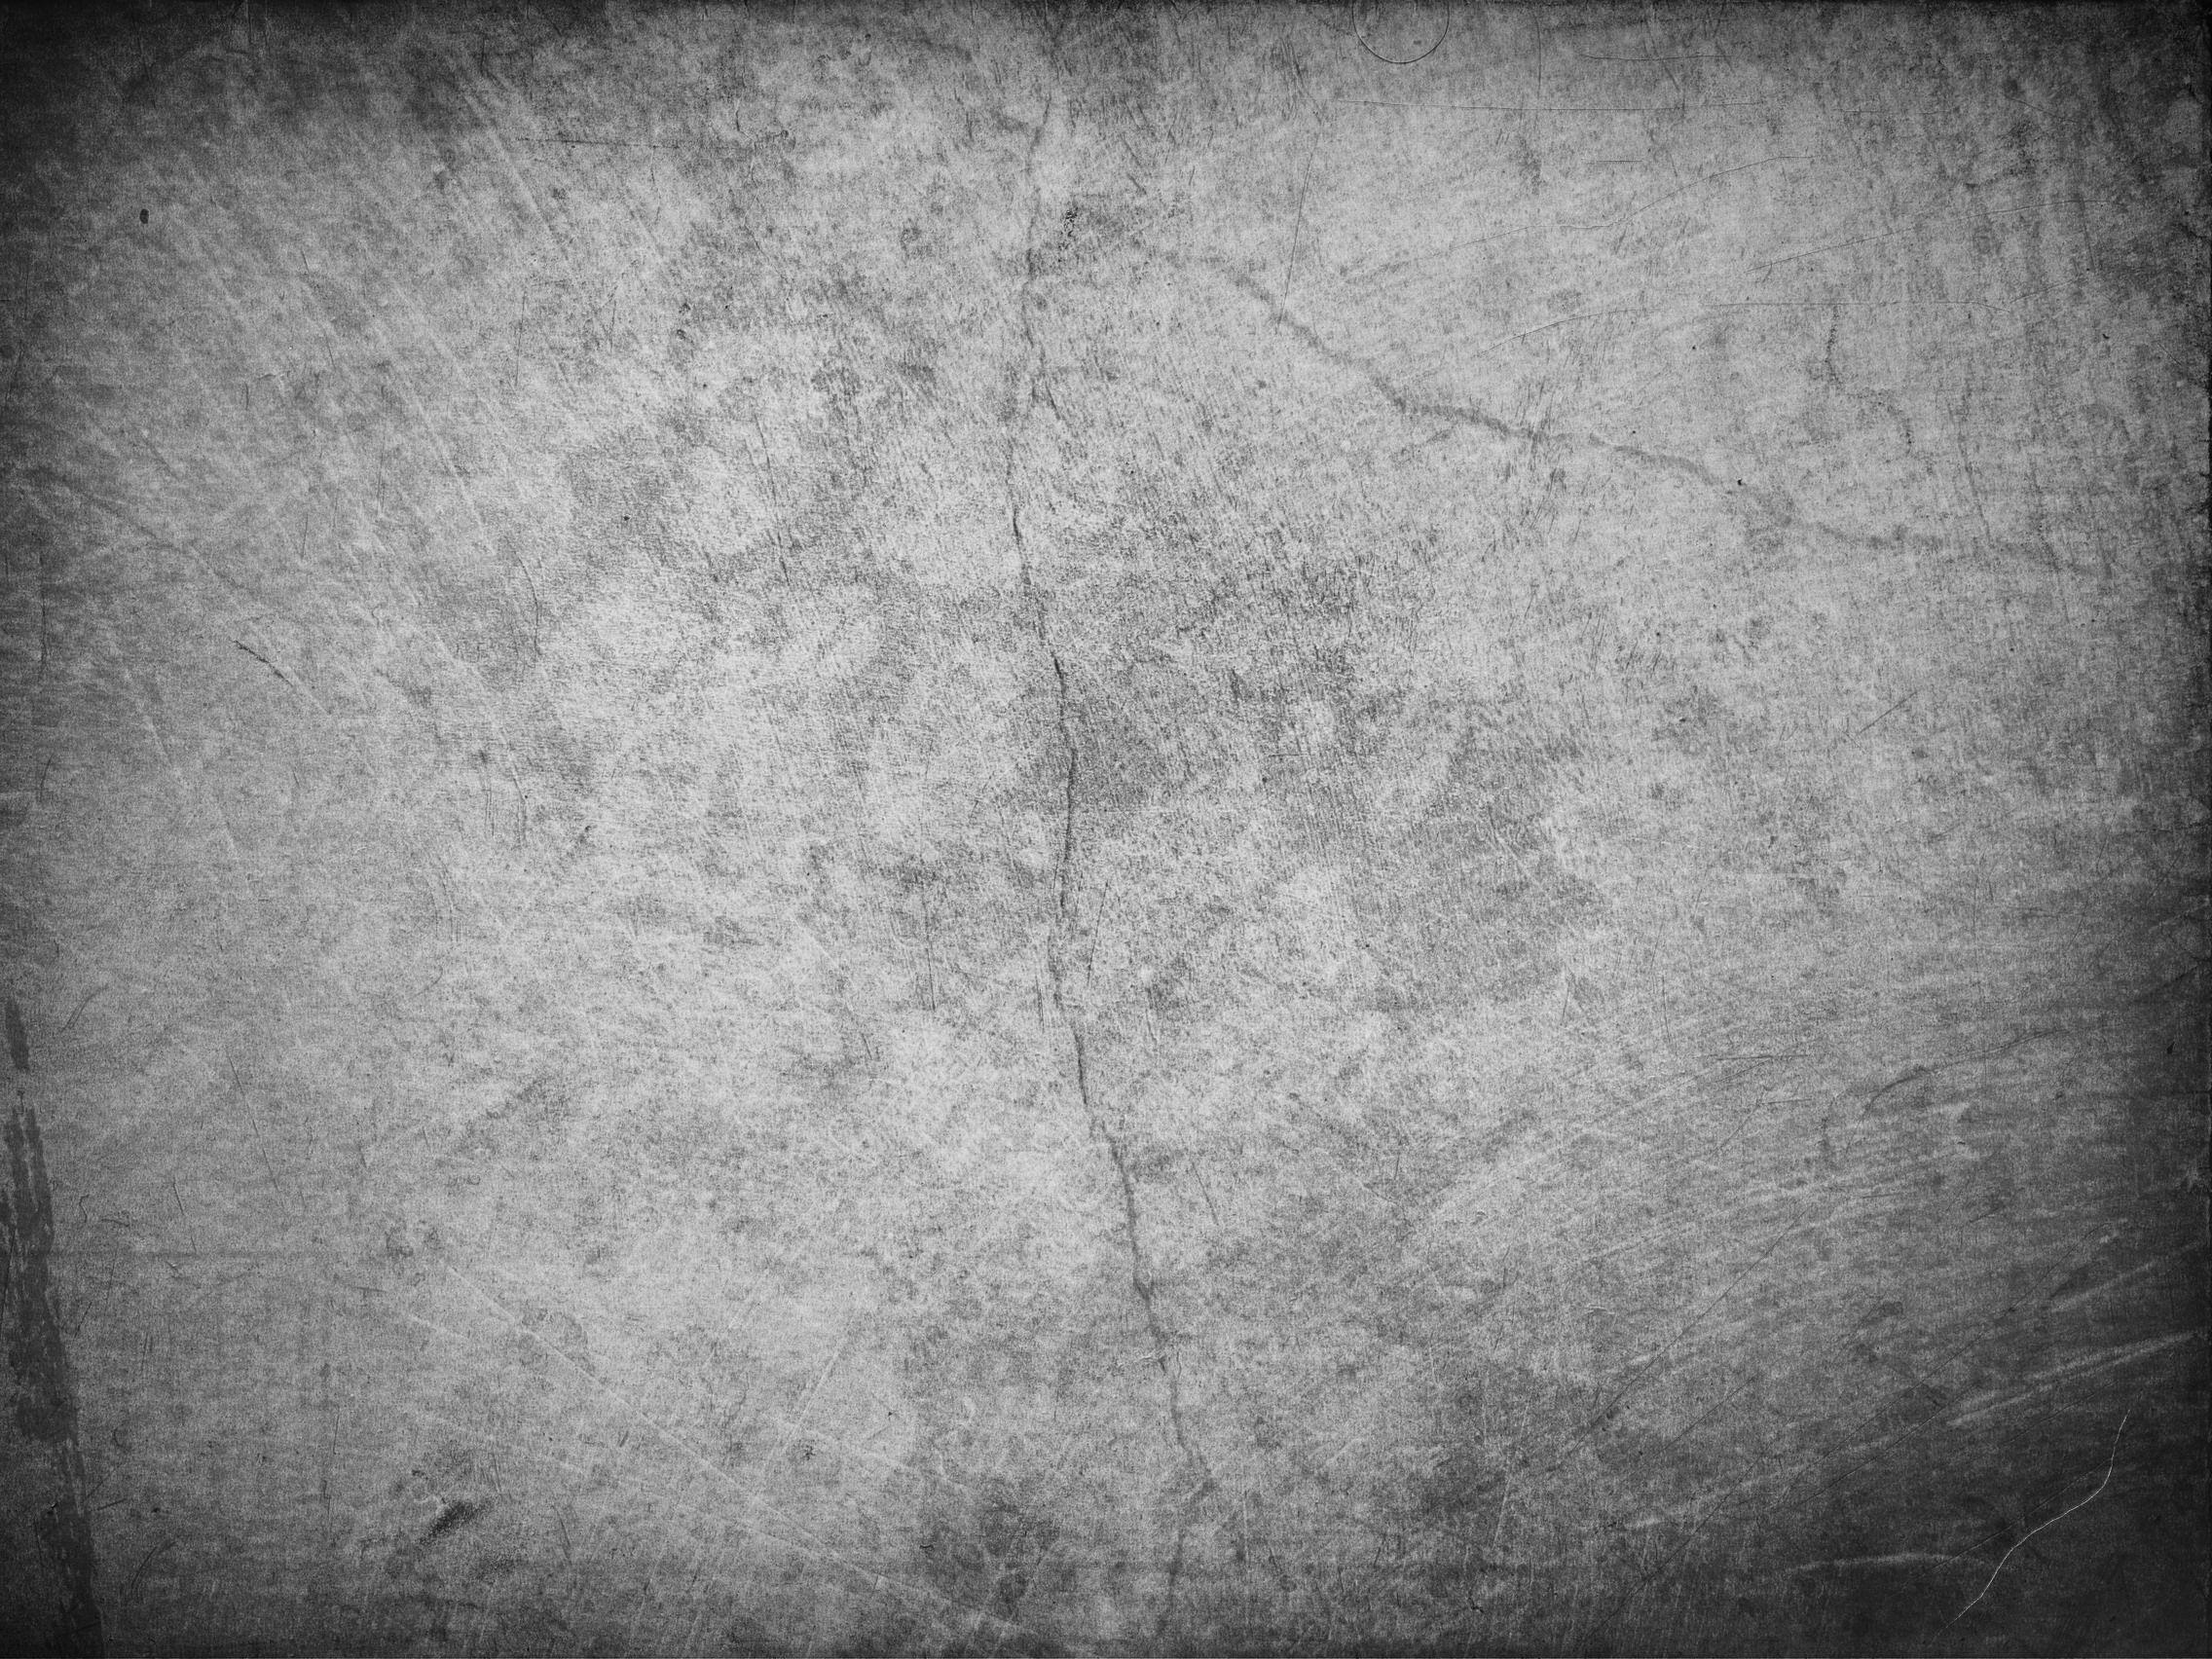 Grey Grunge Wallpapers Top Free Grey Grunge Backgrounds Wallpaperaccess Download 263,232 grunge background free vectors. grey grunge wallpapers top free grey